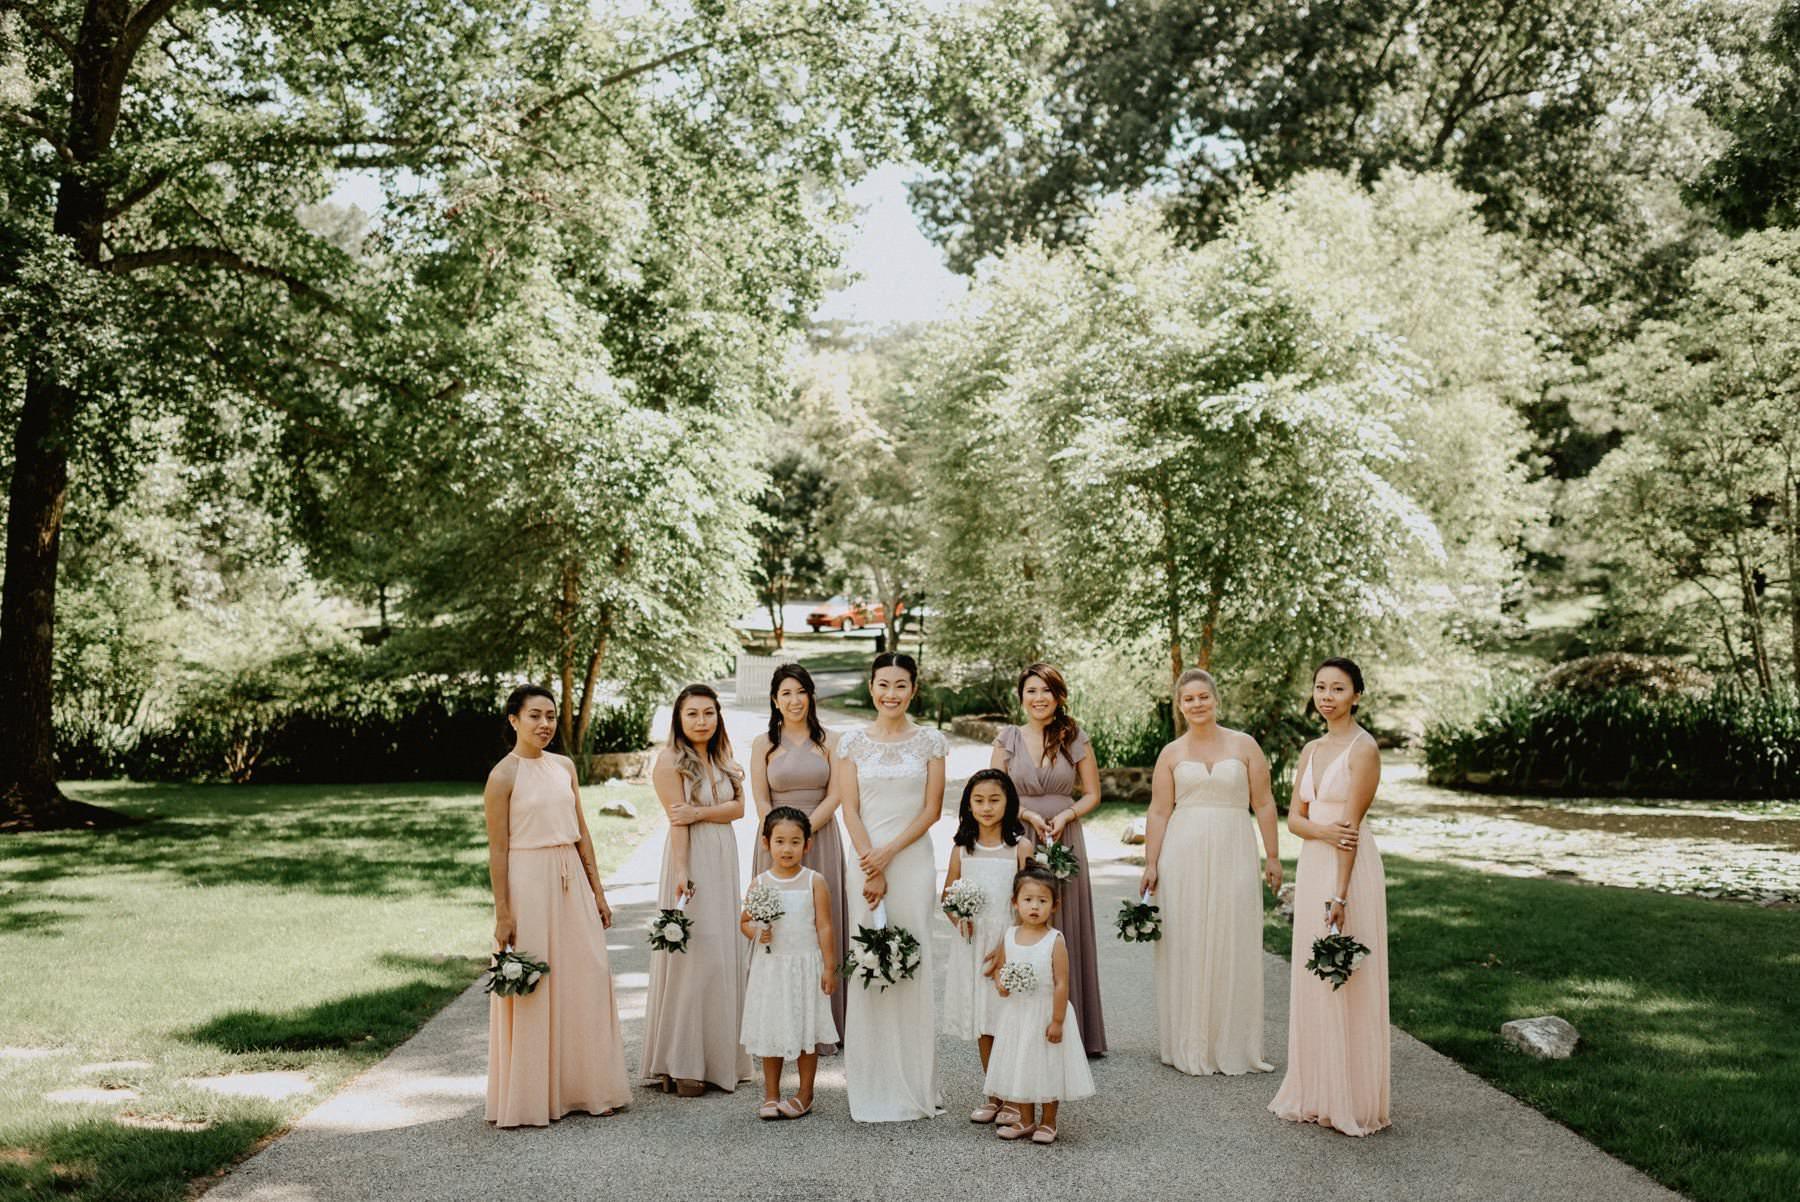 Appleford-estate-wedding-50.jpg